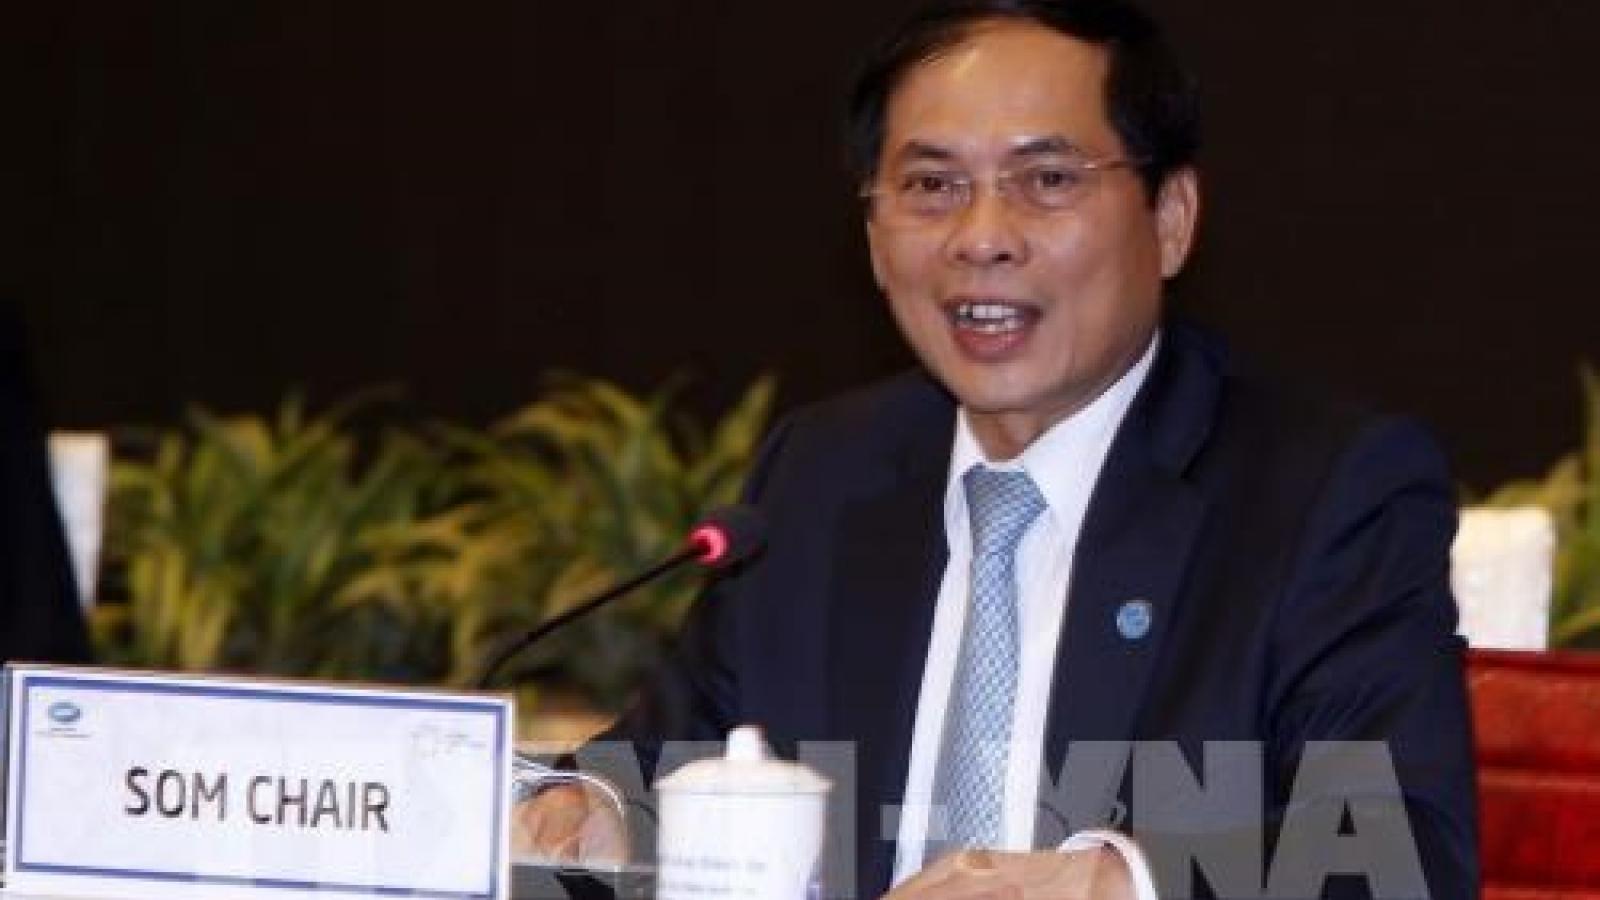 APEC SOM Chairman urges joint efforts to shape APEC's future